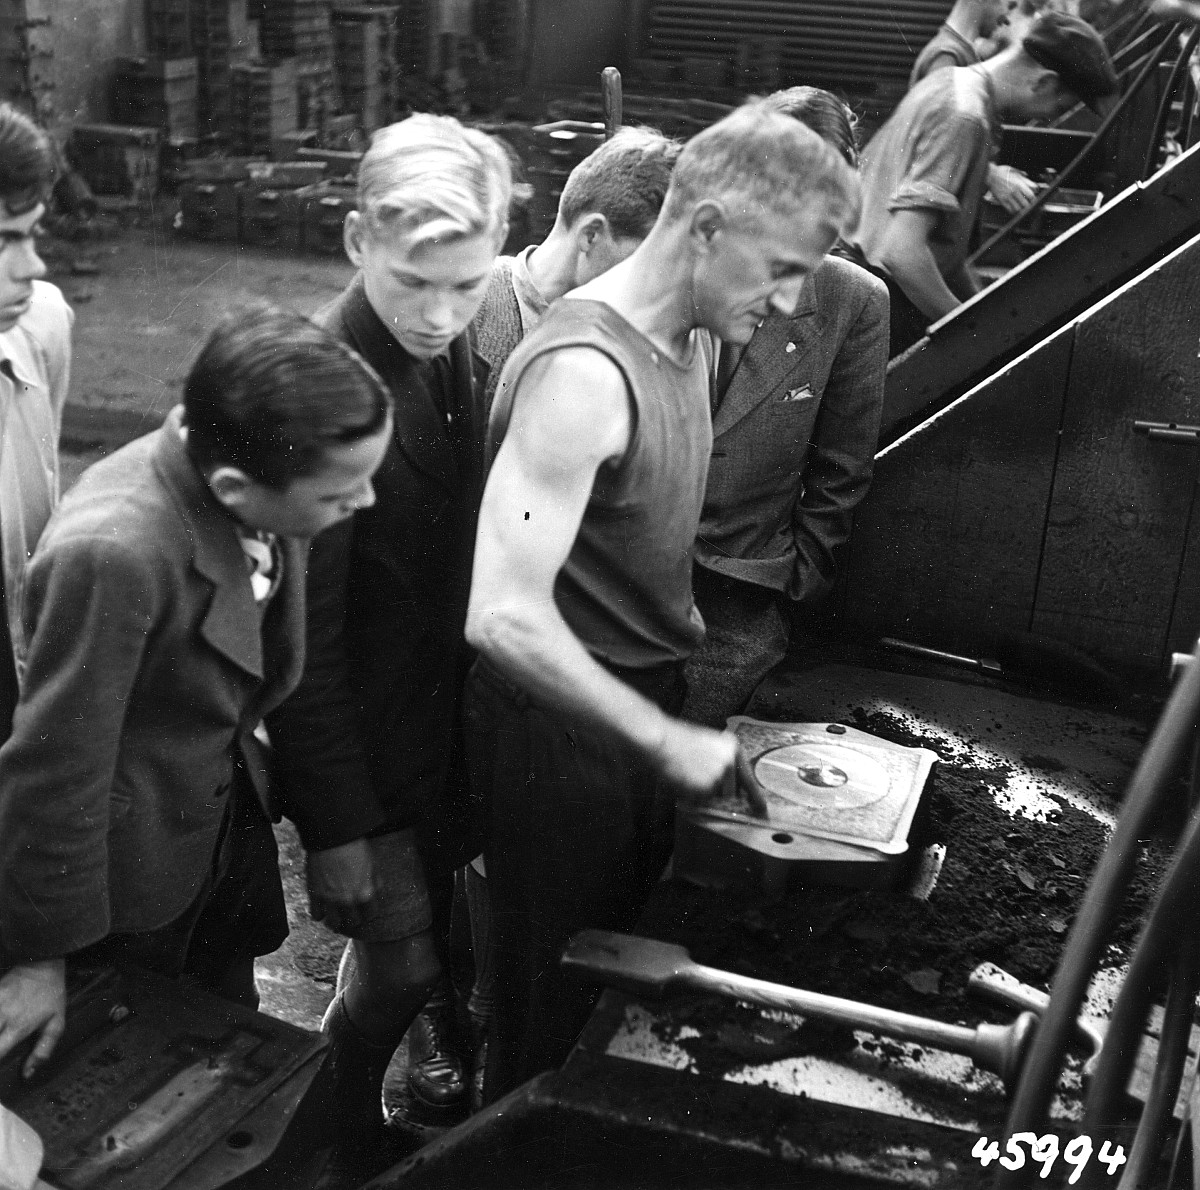 GFA 12/45994: Reportage casting process in malleable casting